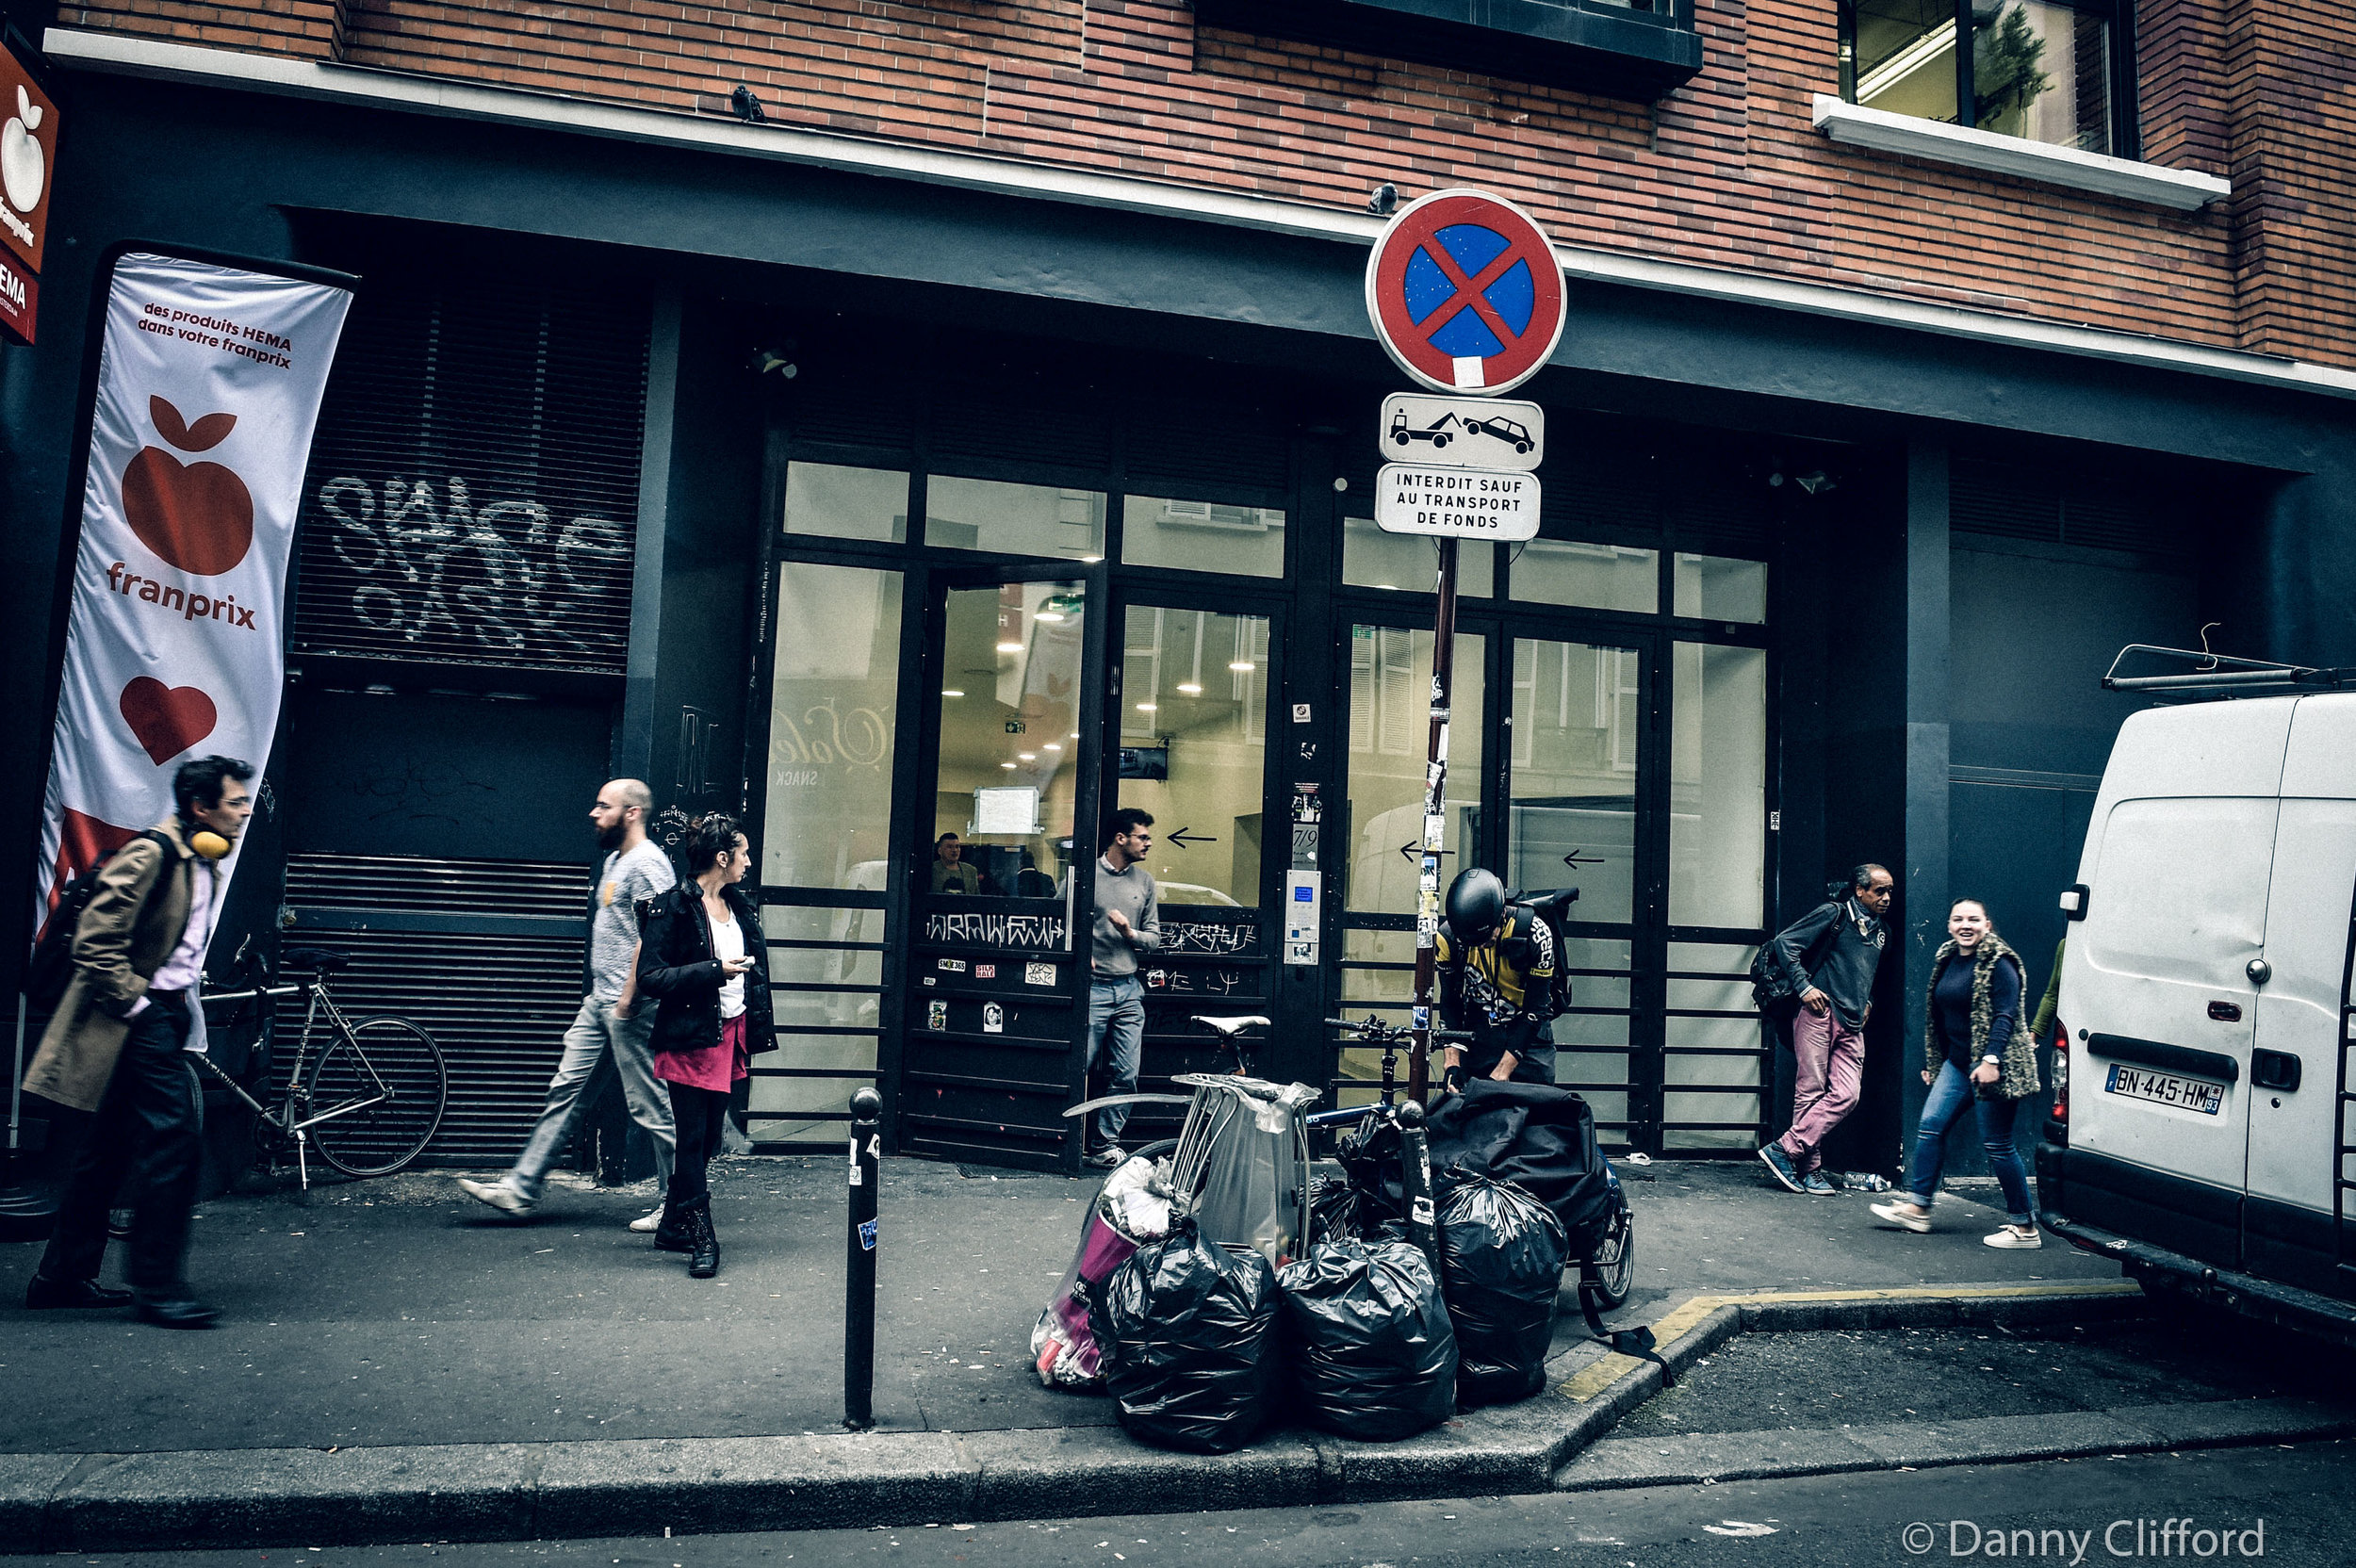 The entrance to Studio Bleu, Paris